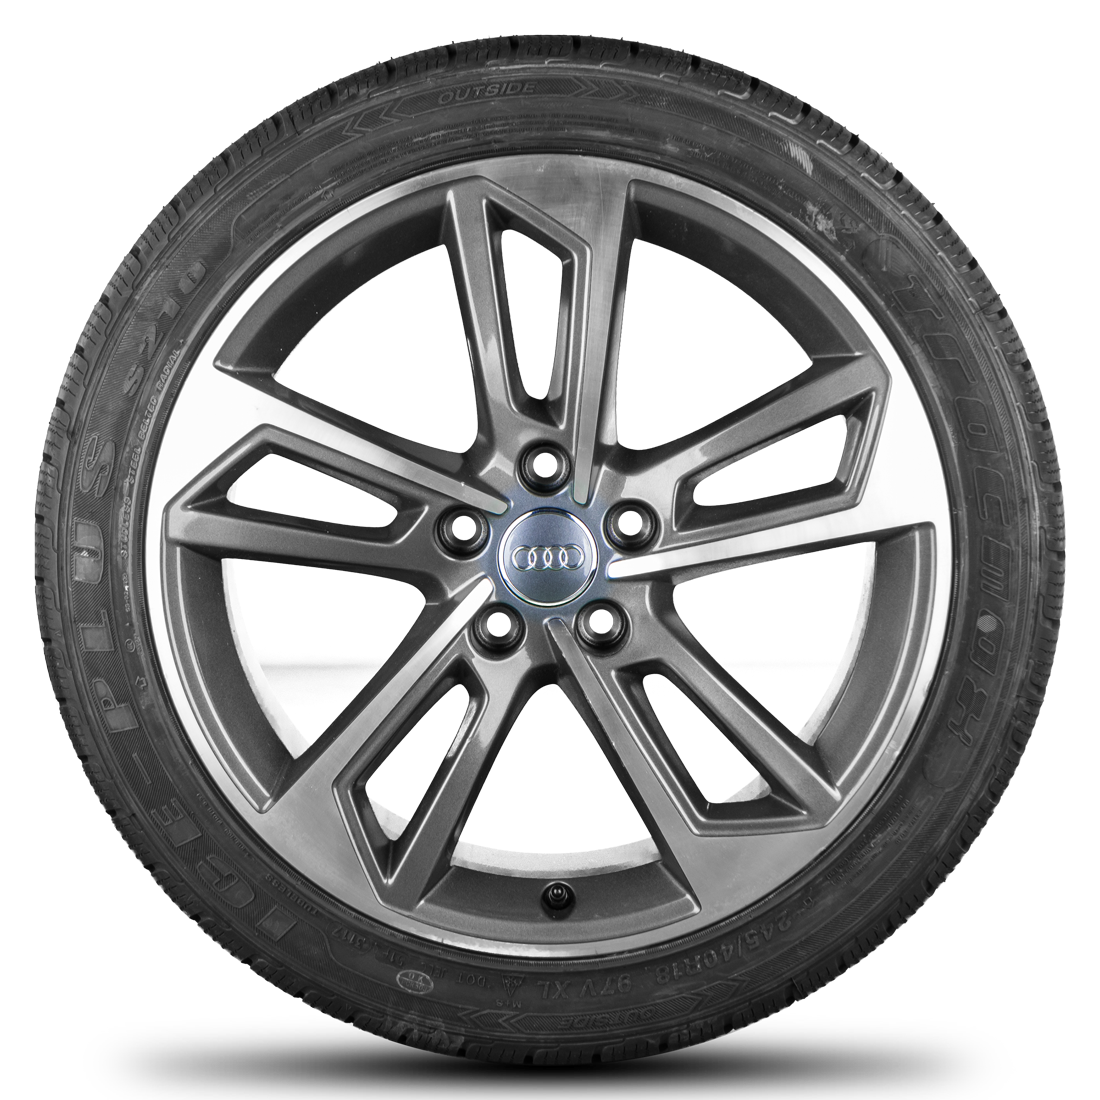 Audi 18 Zoll Felgen A4 S4 8W Rotor Alufelgen Winterreifen Winterräder Neu